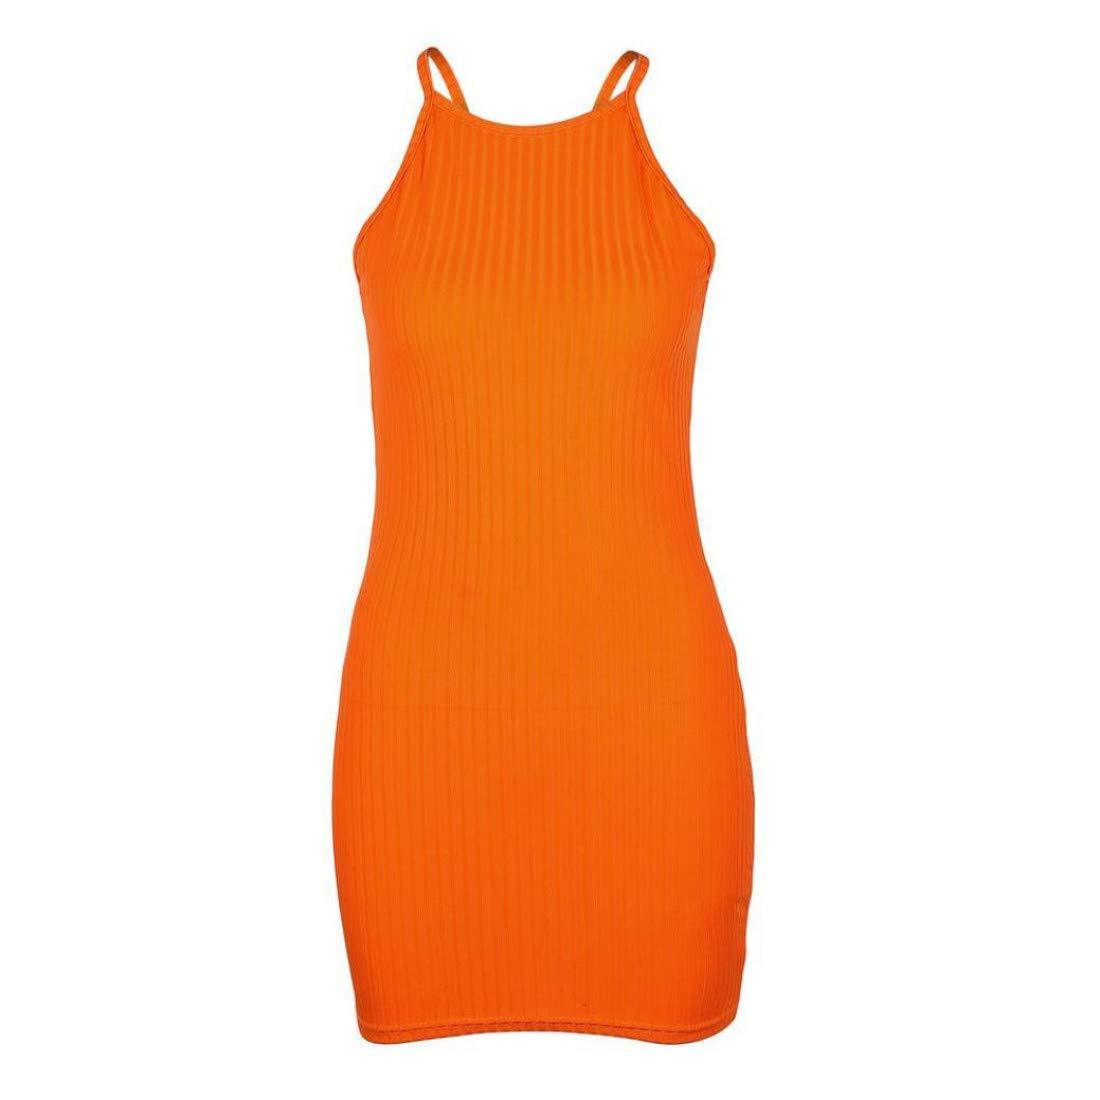 PCEPEIVK Women Sling Sleeveless Holiday Party Mini Dress Dresses